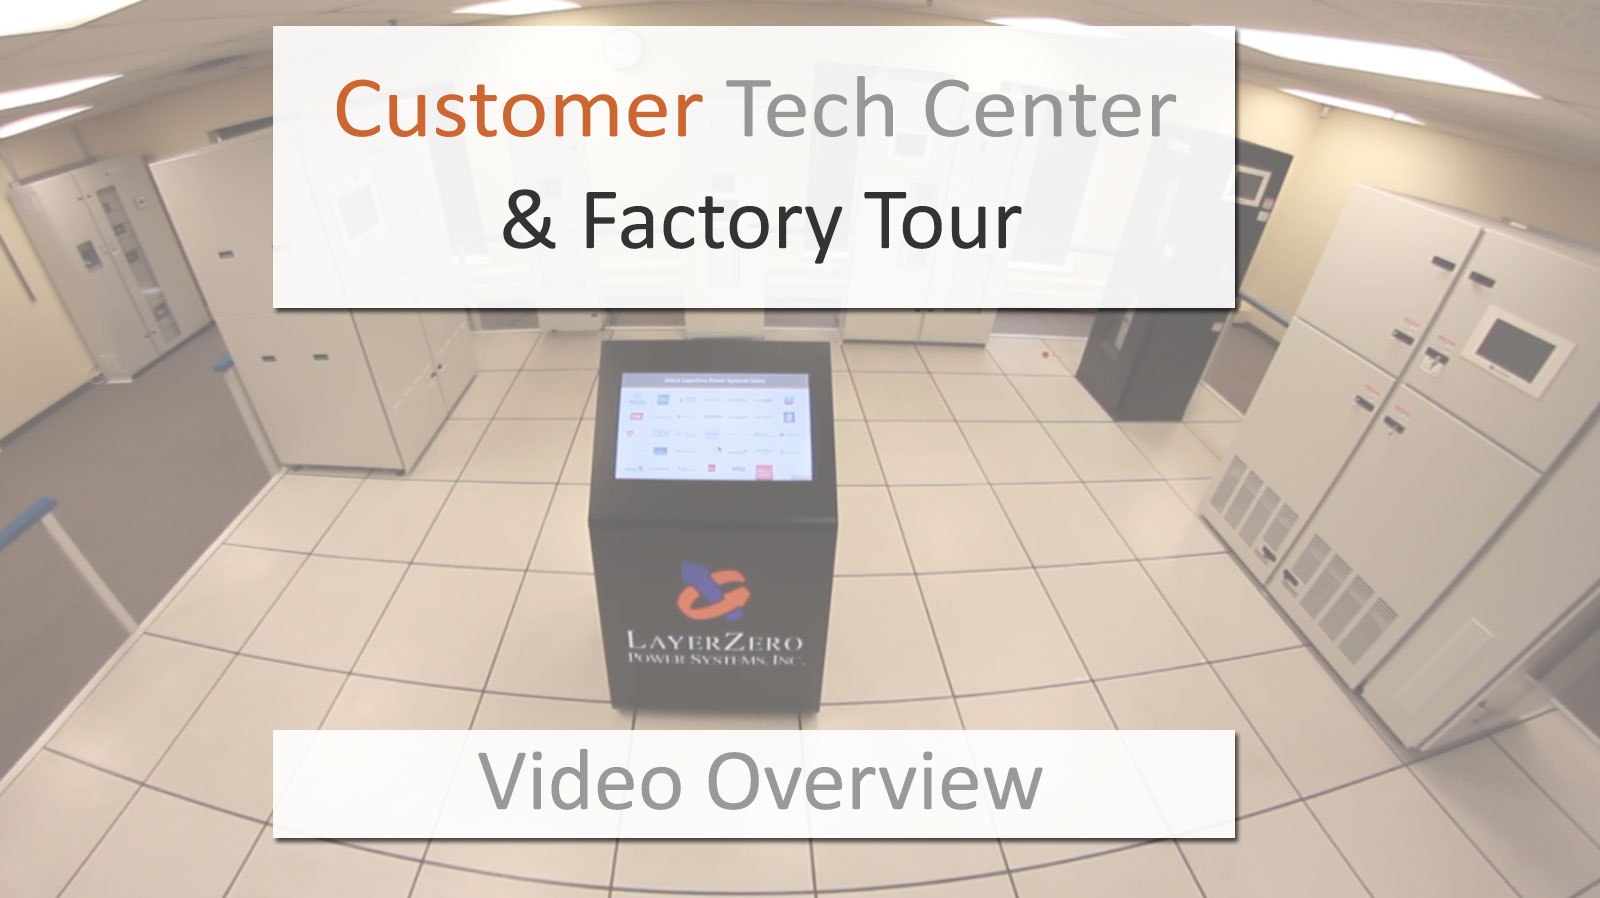 LayerZero Customer Tech Center and Factory Tours